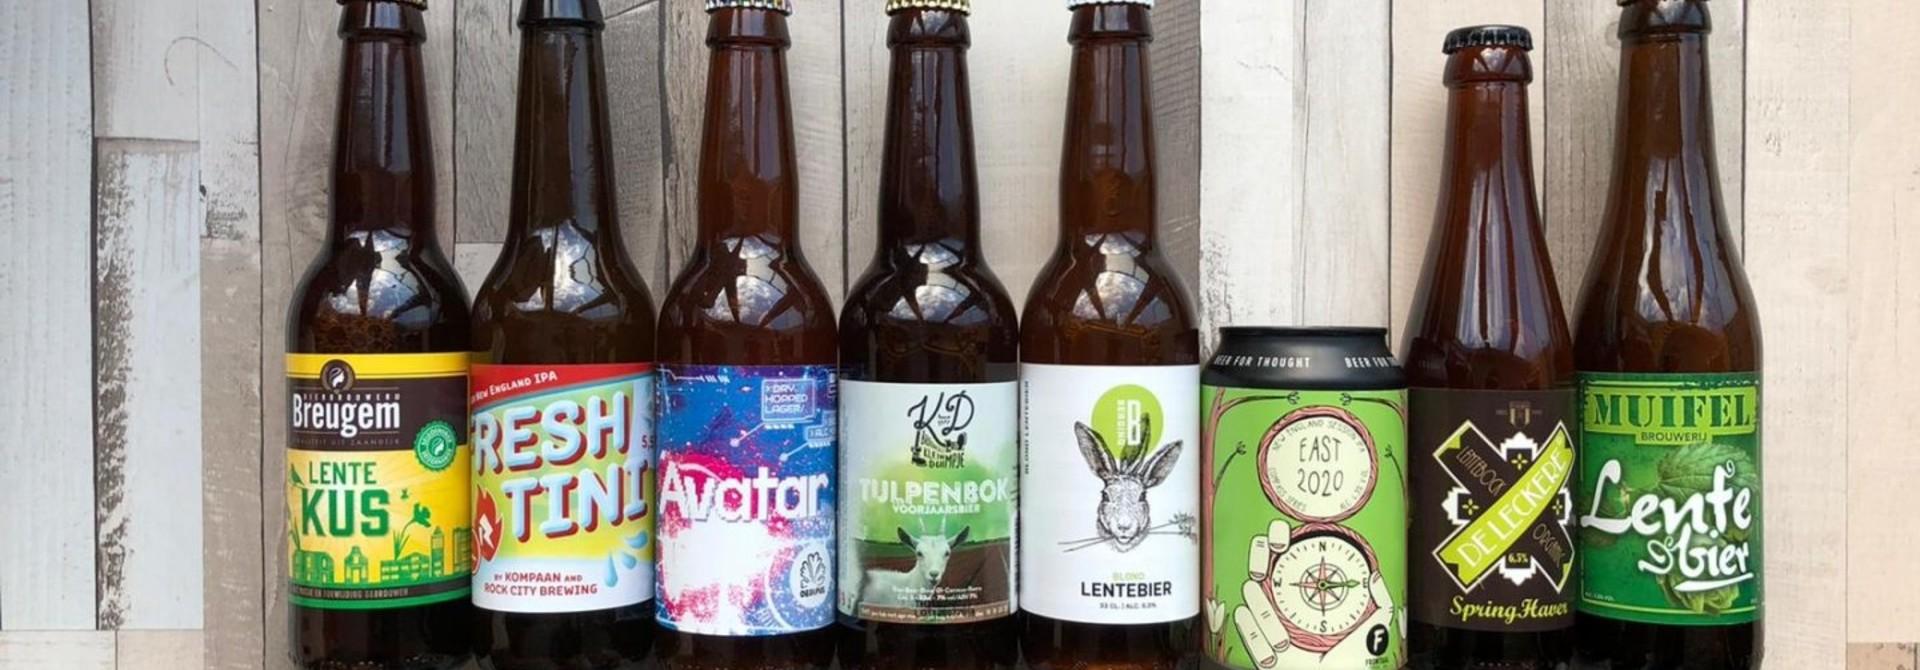 Speciaalbier – bierpakket februari 2020